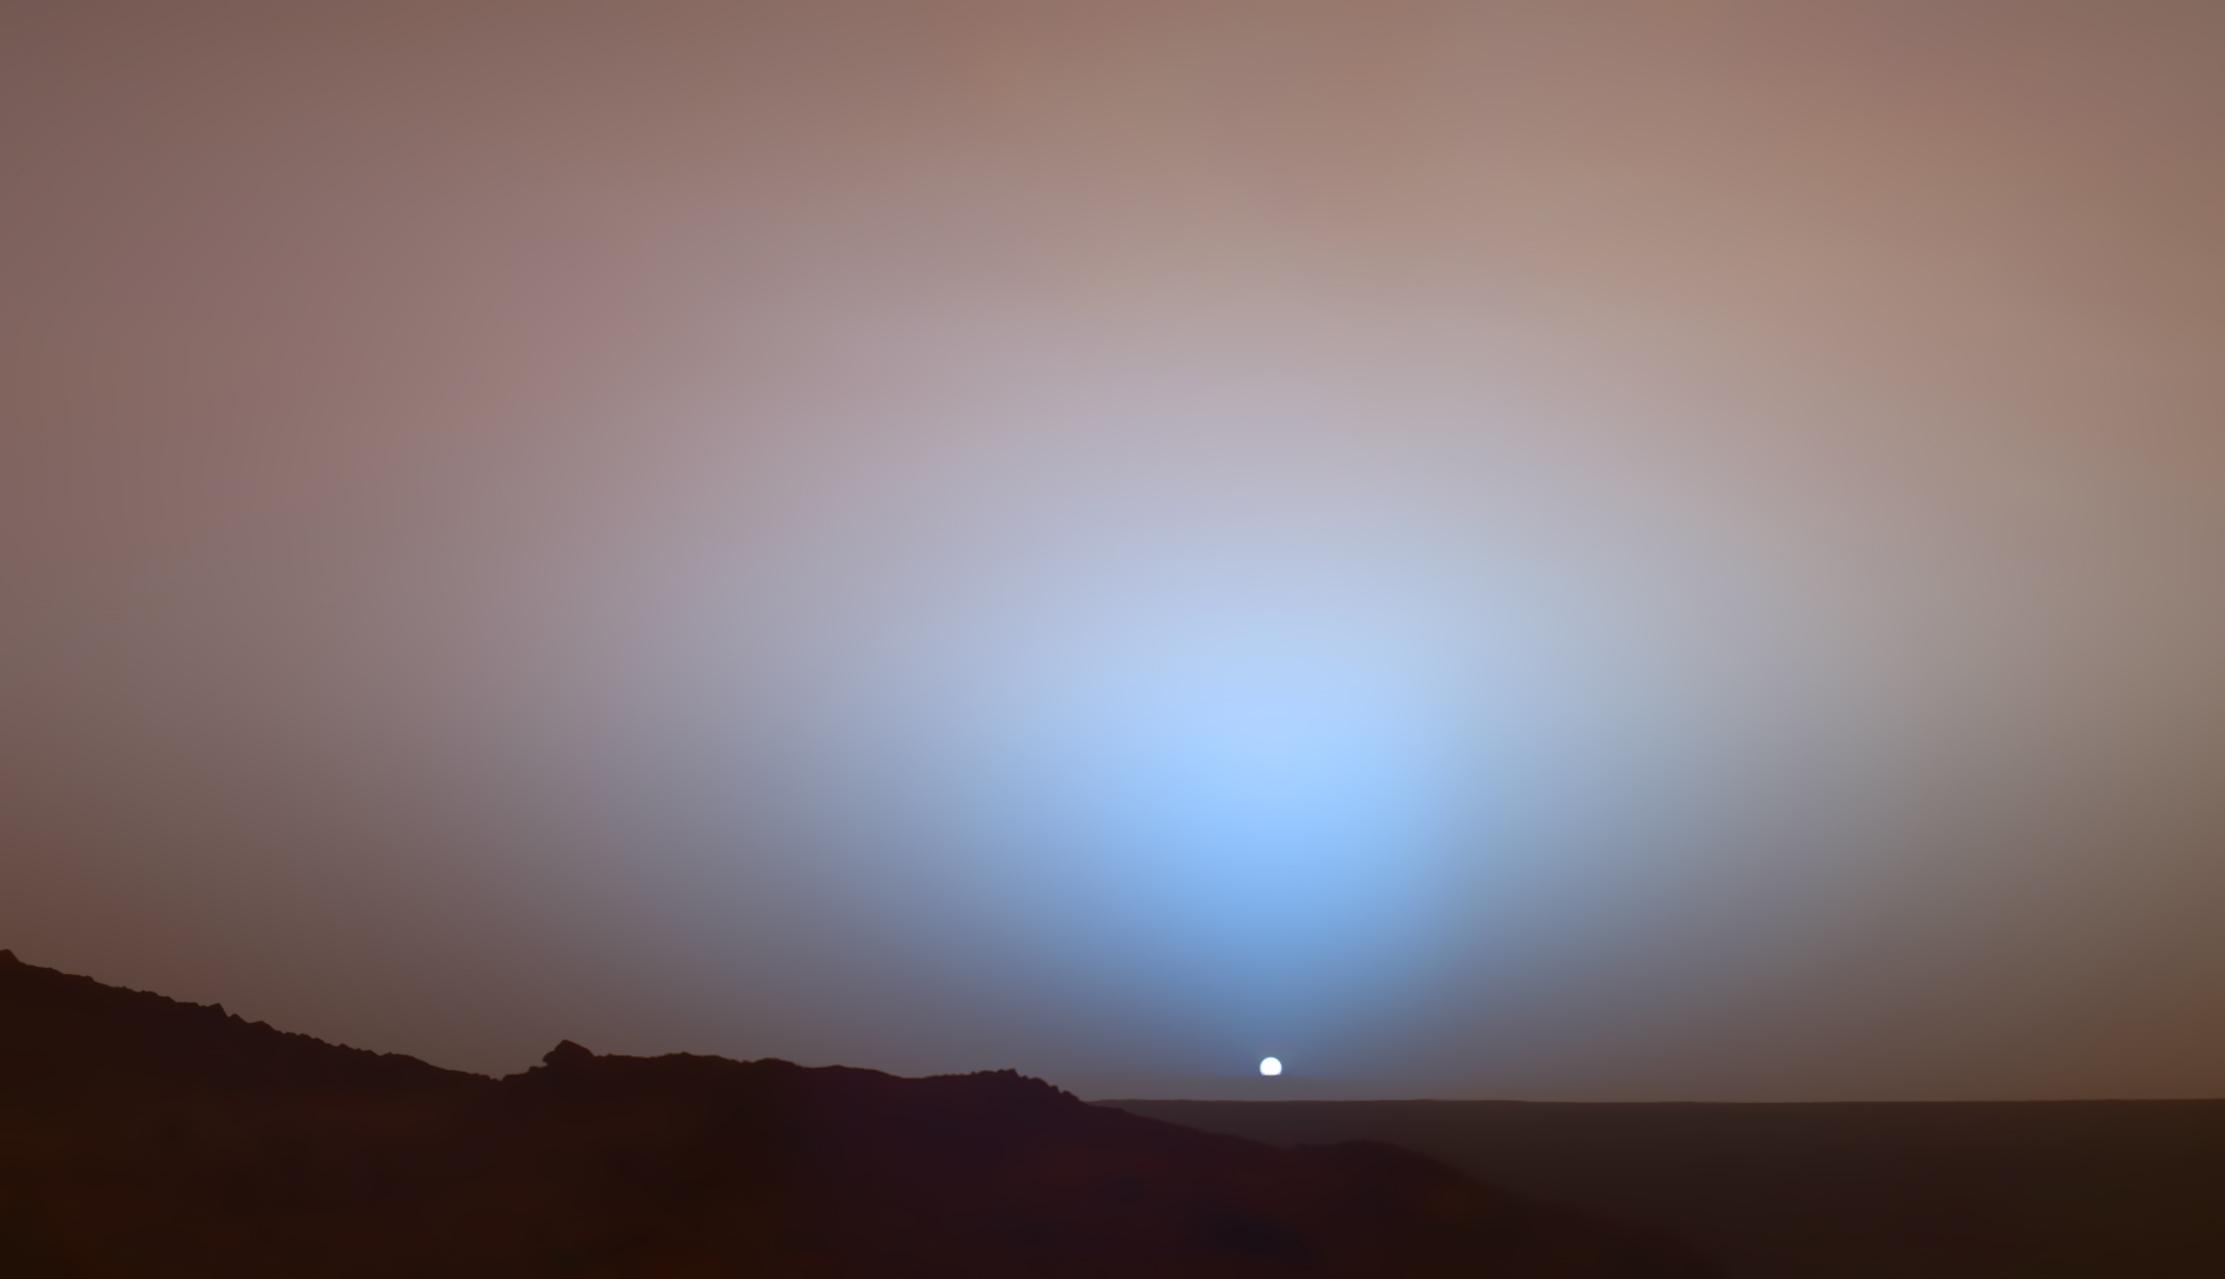 curiosity sunrise sunset times - HD2088×1200